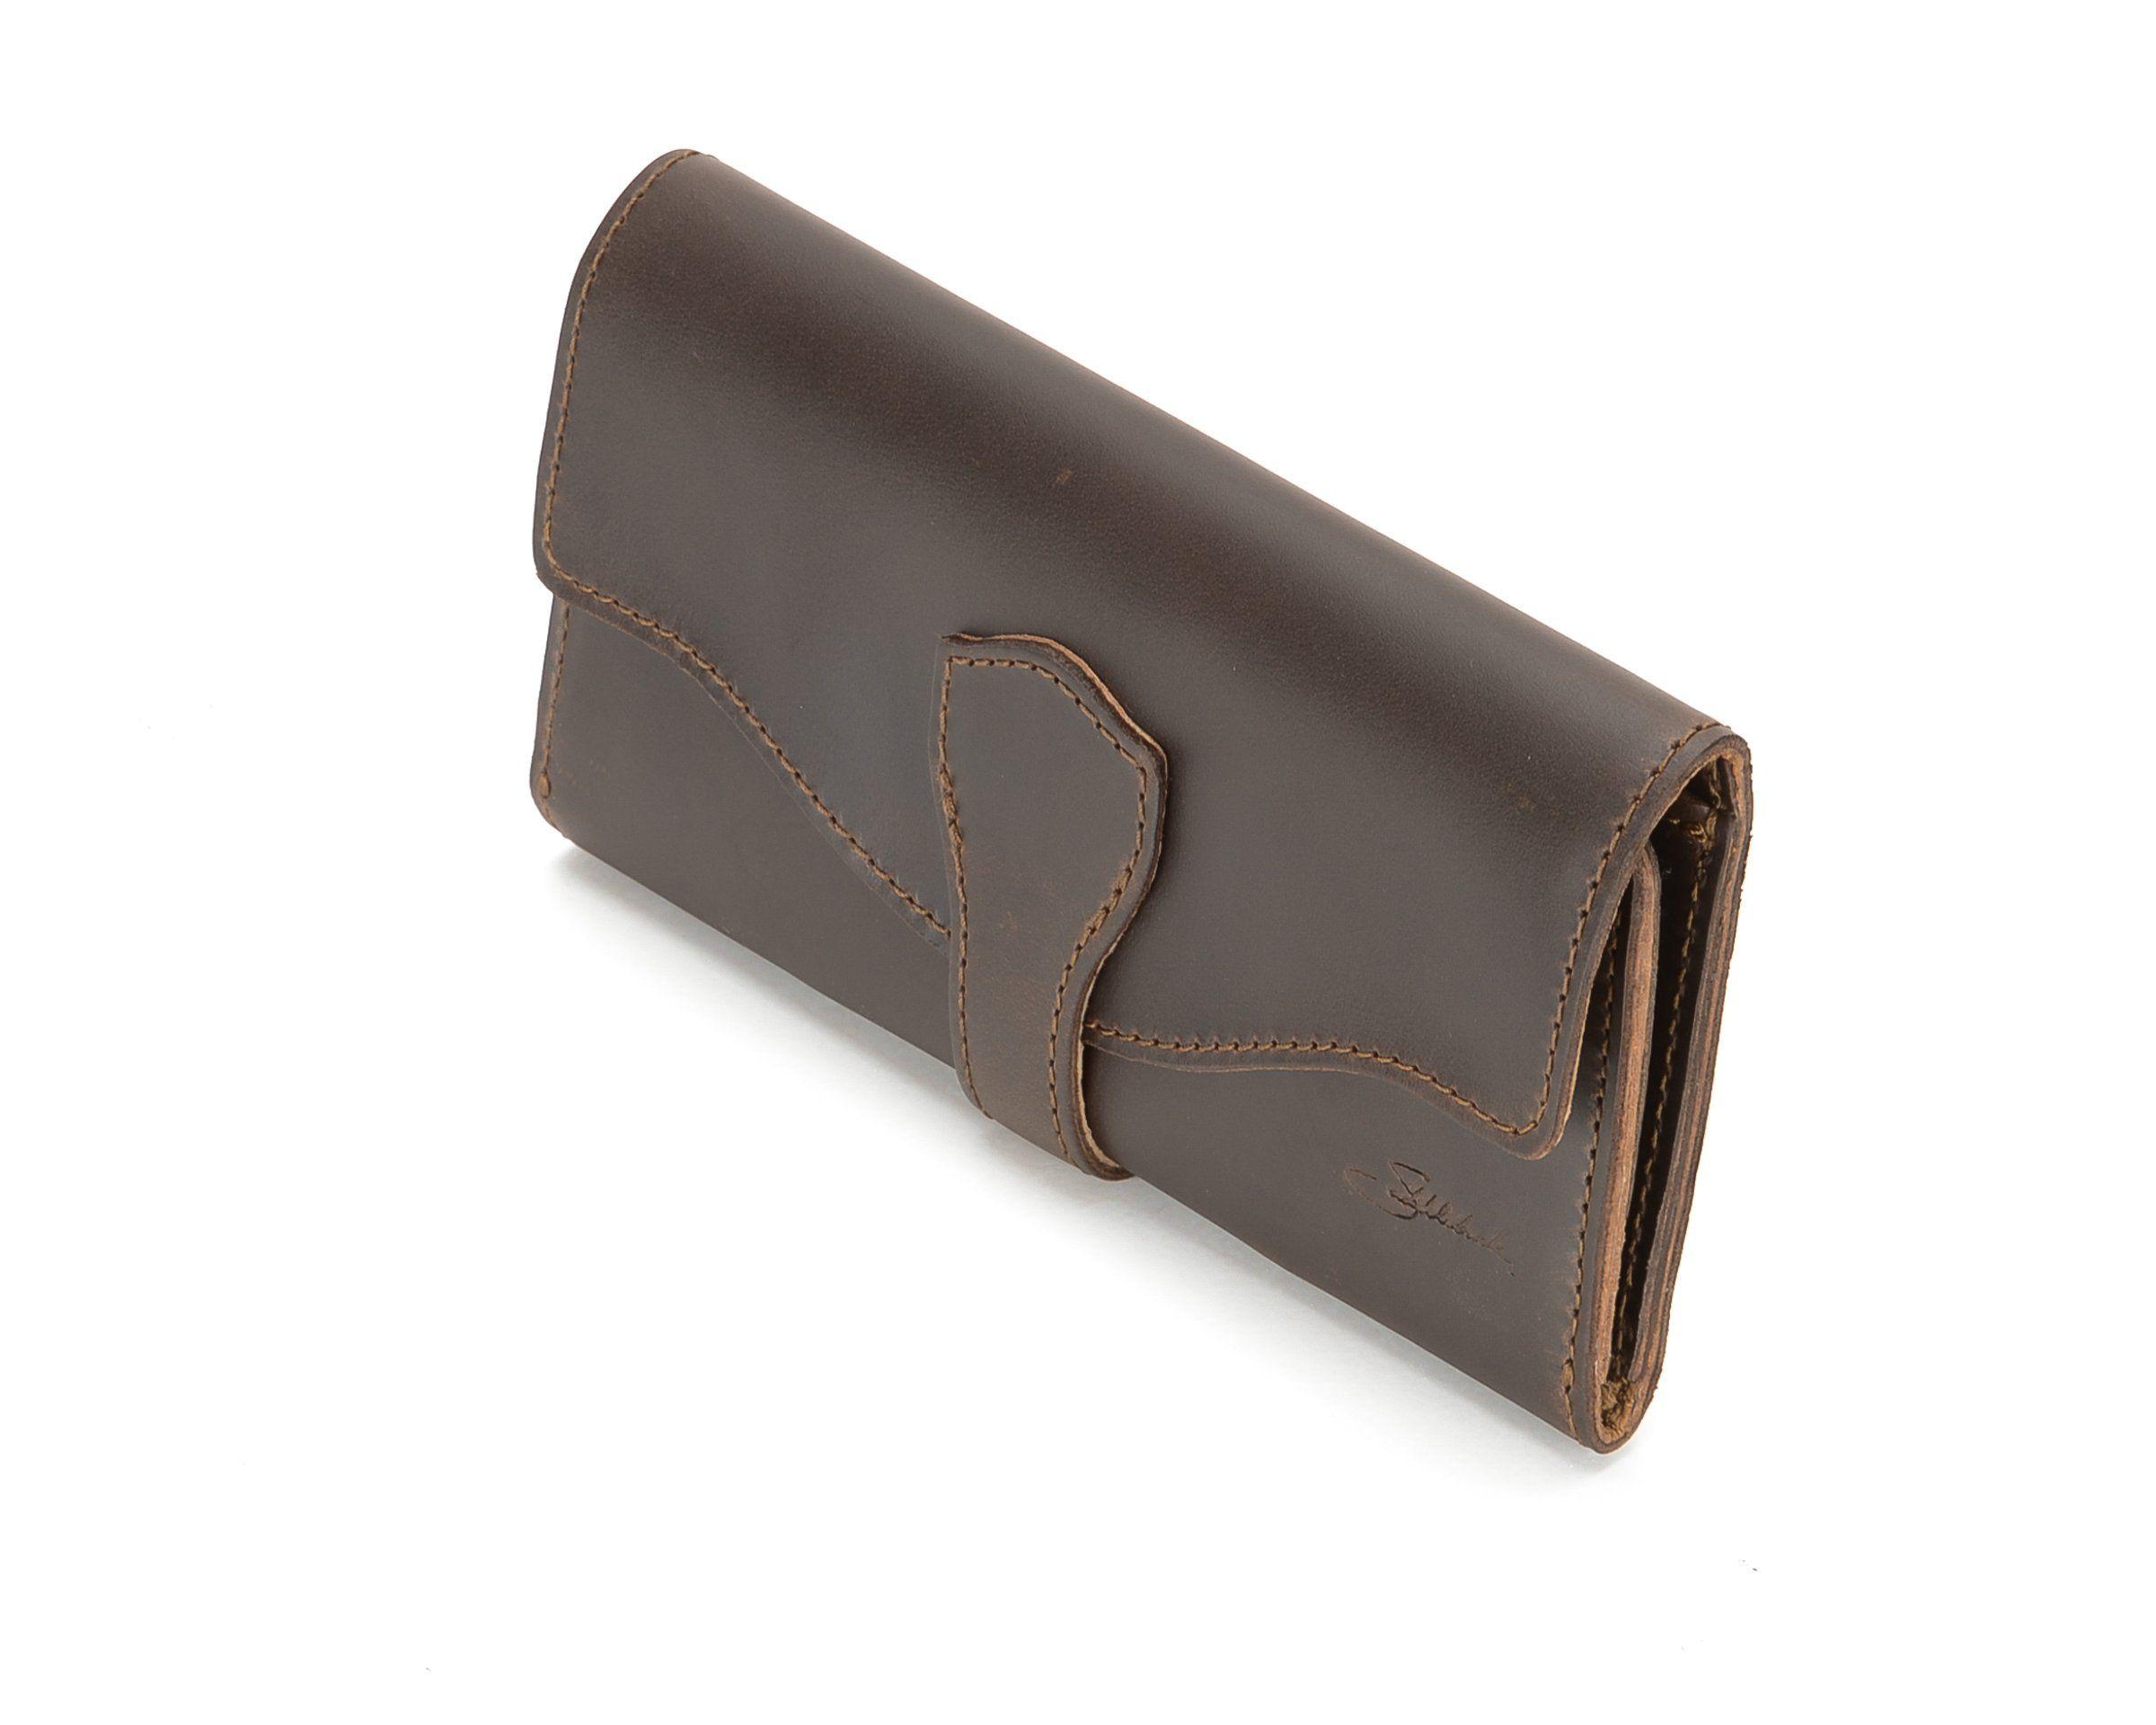 da28b7f17fa1e Amazon.com  Saddleback Leather Long Trifold Wallet in Chestnut  Full Grain  Leather with 100 Year Warranty  Clothing